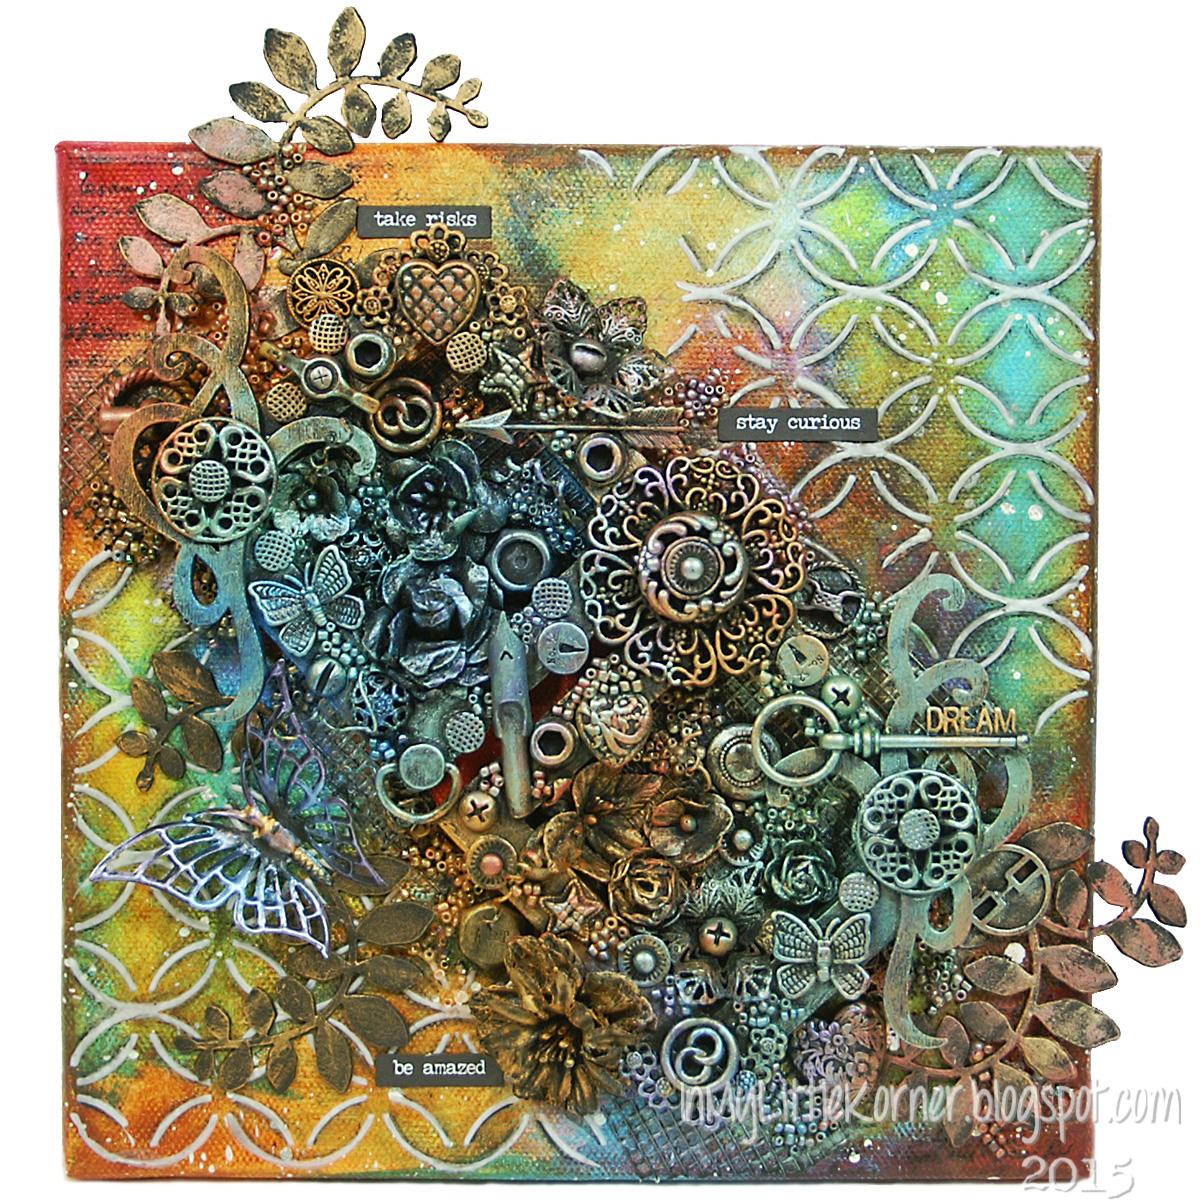 Canvas featuring Viva Decor | Creative Scrapbooker Magazine